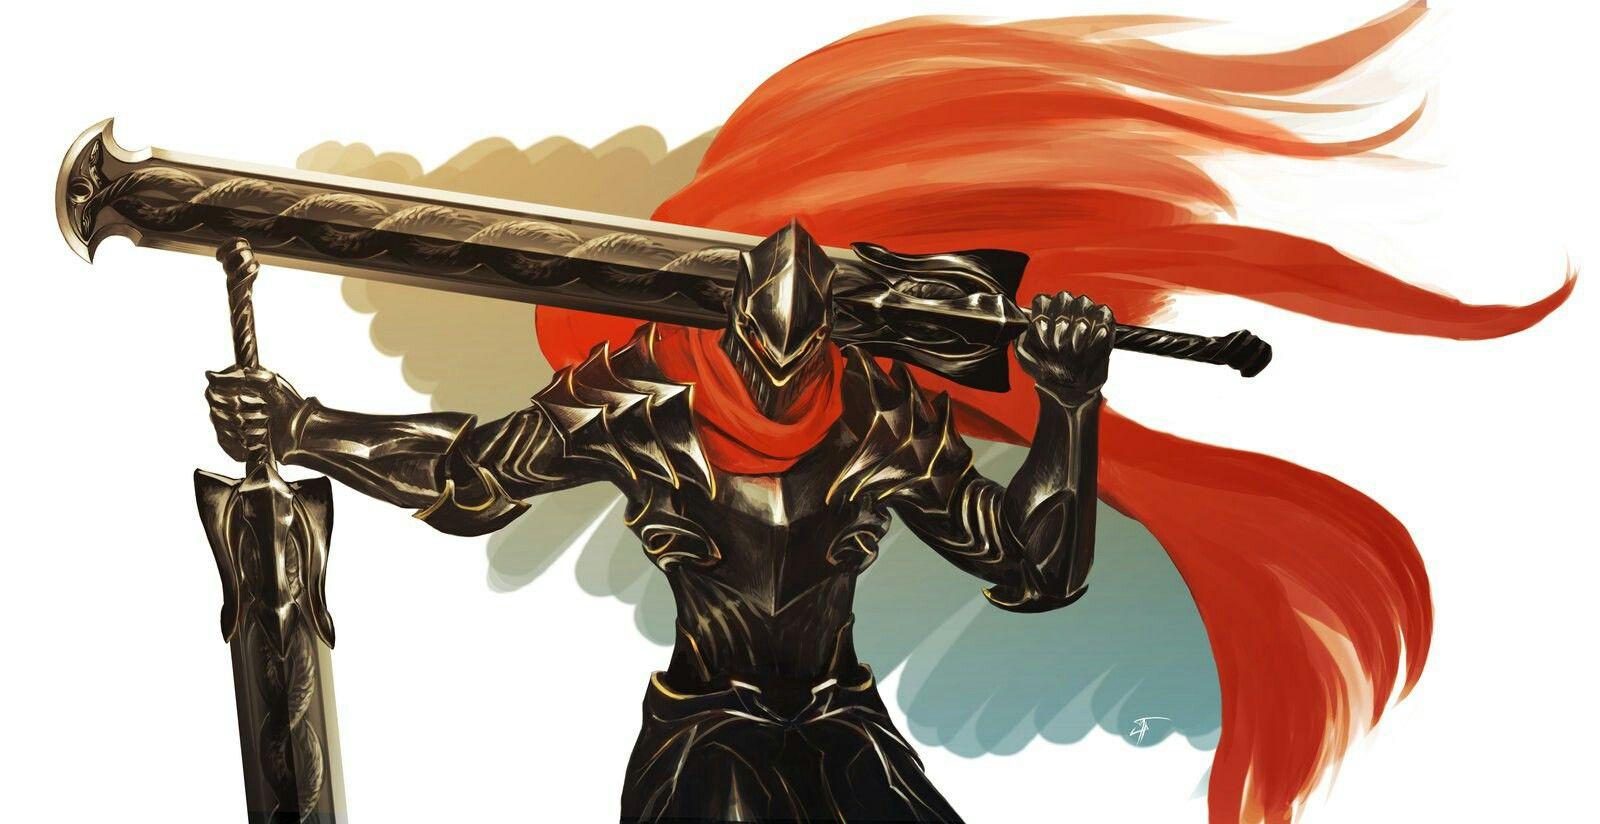 Ainz as lord momon the dark hero anime anime art